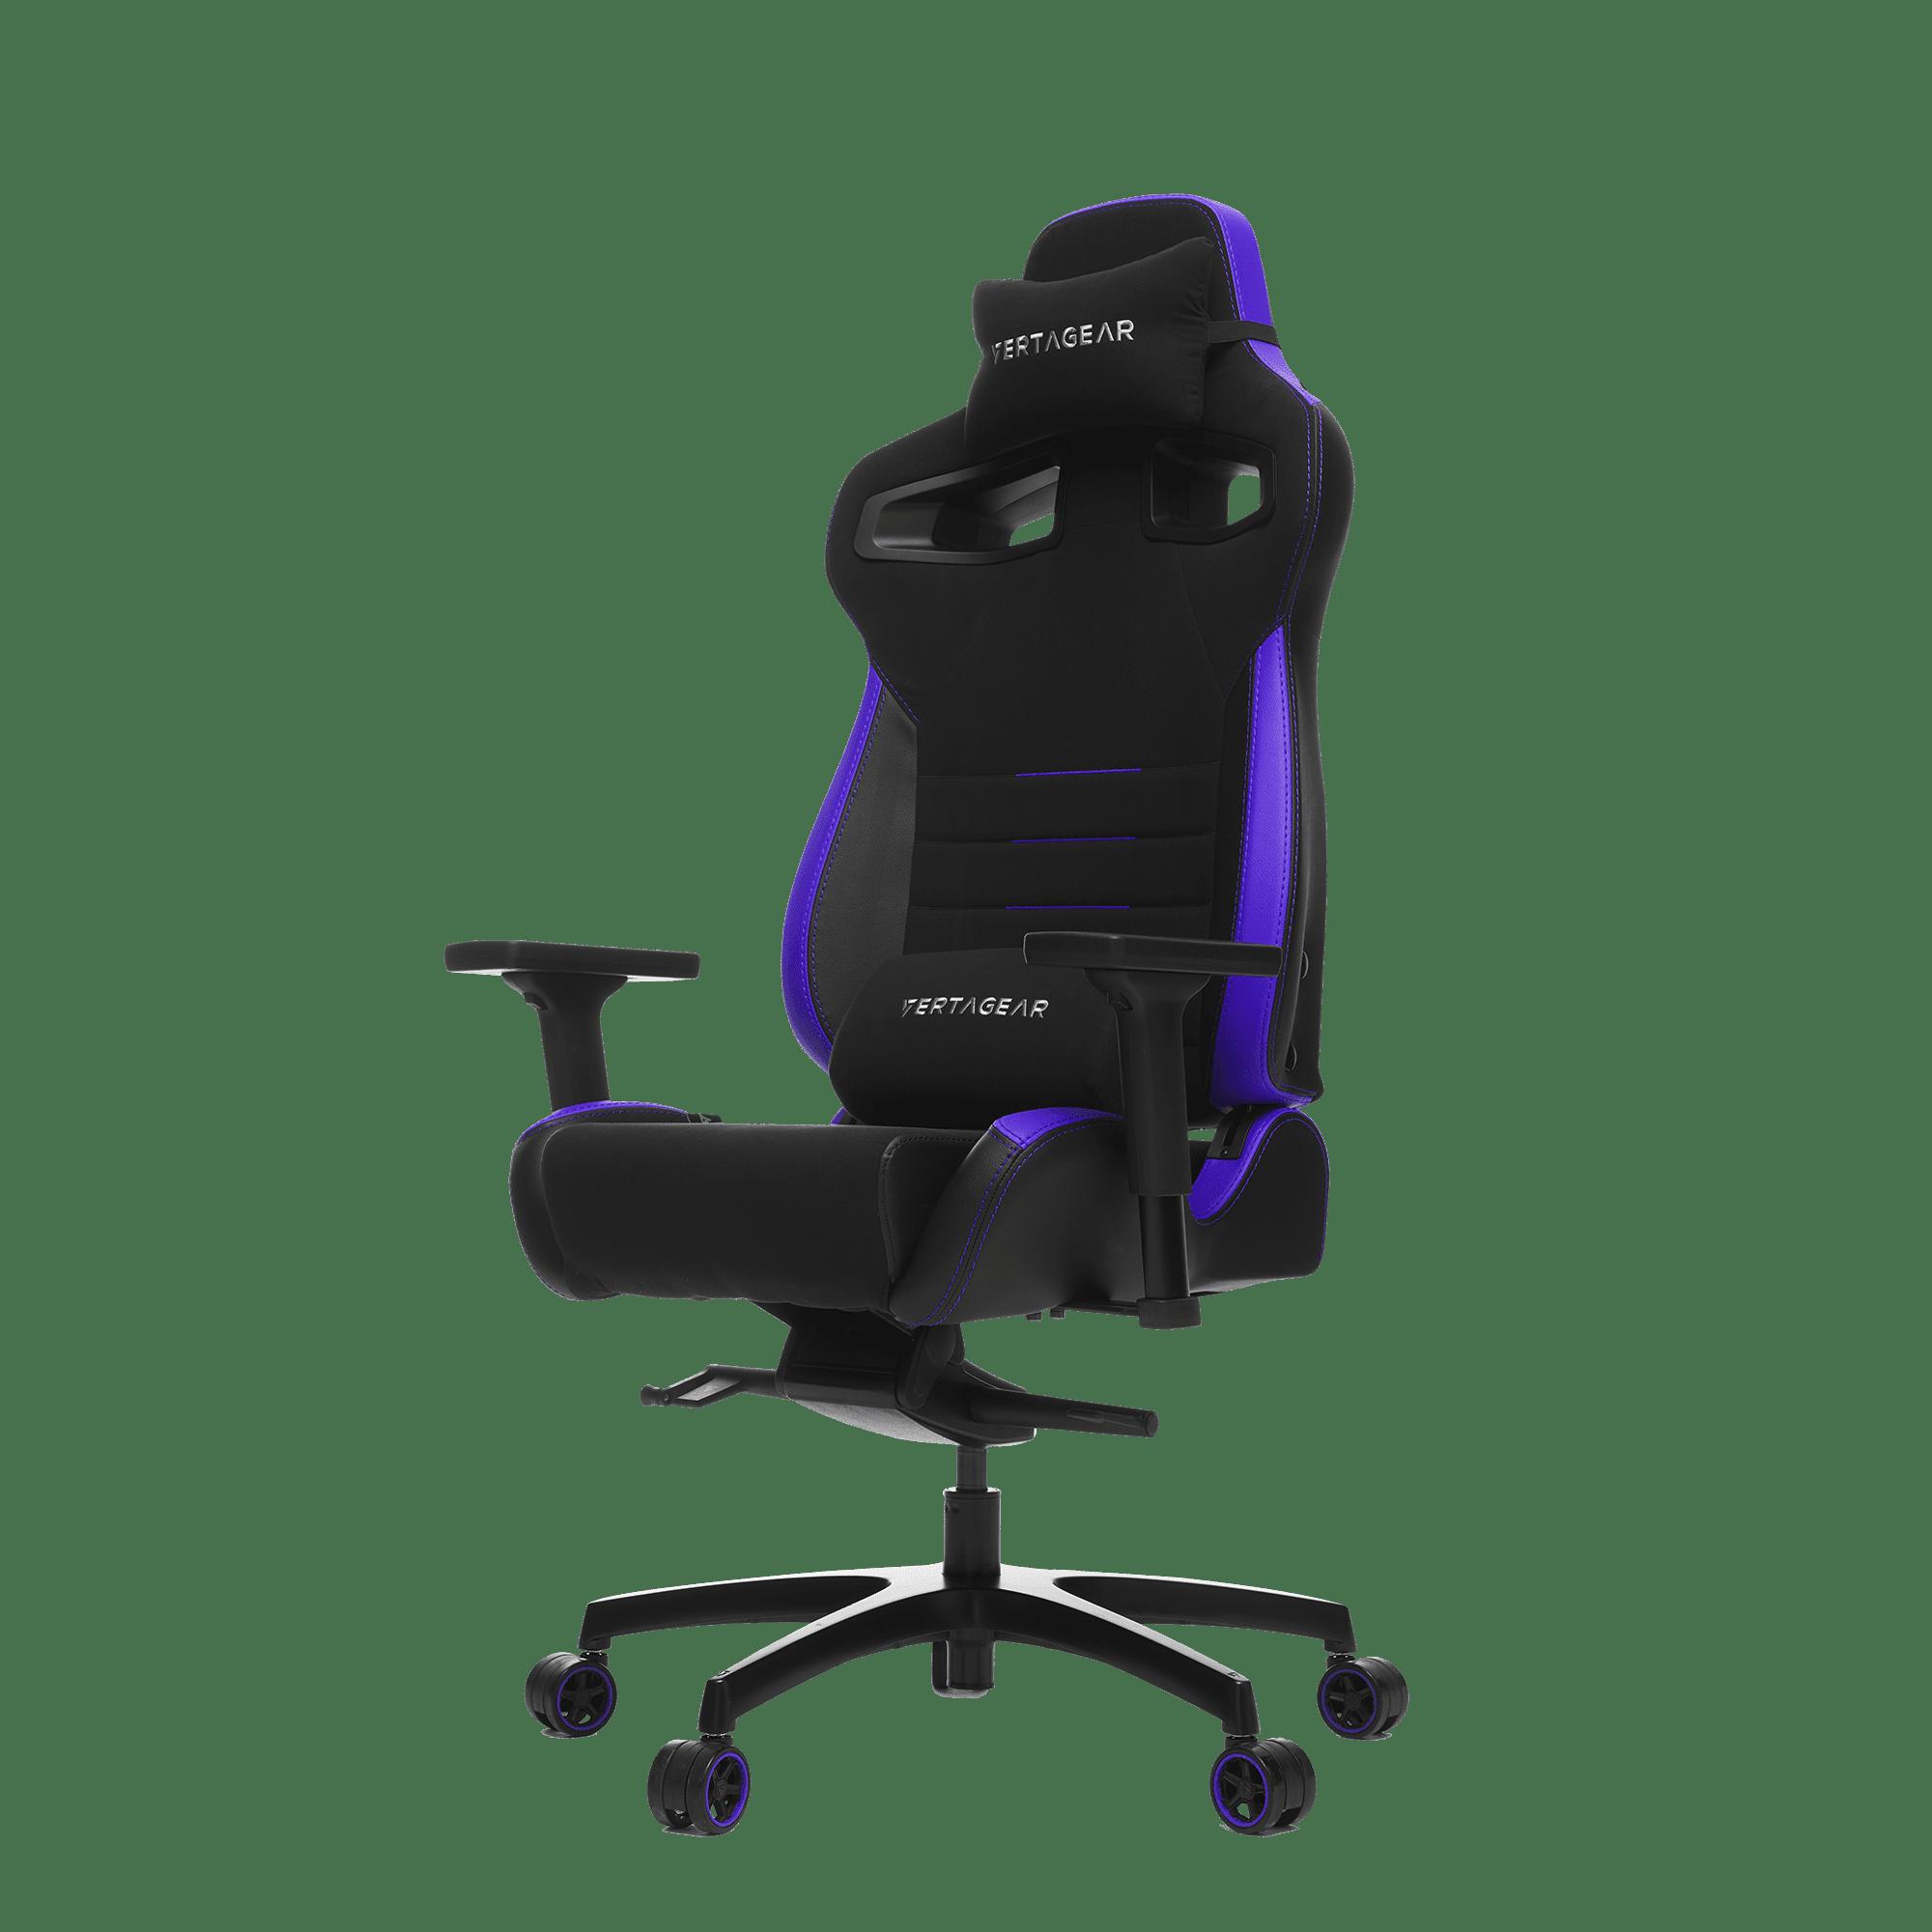 Vertagear Racing Series P-Line PL4500 Gaming Chair Black/Purple Edition